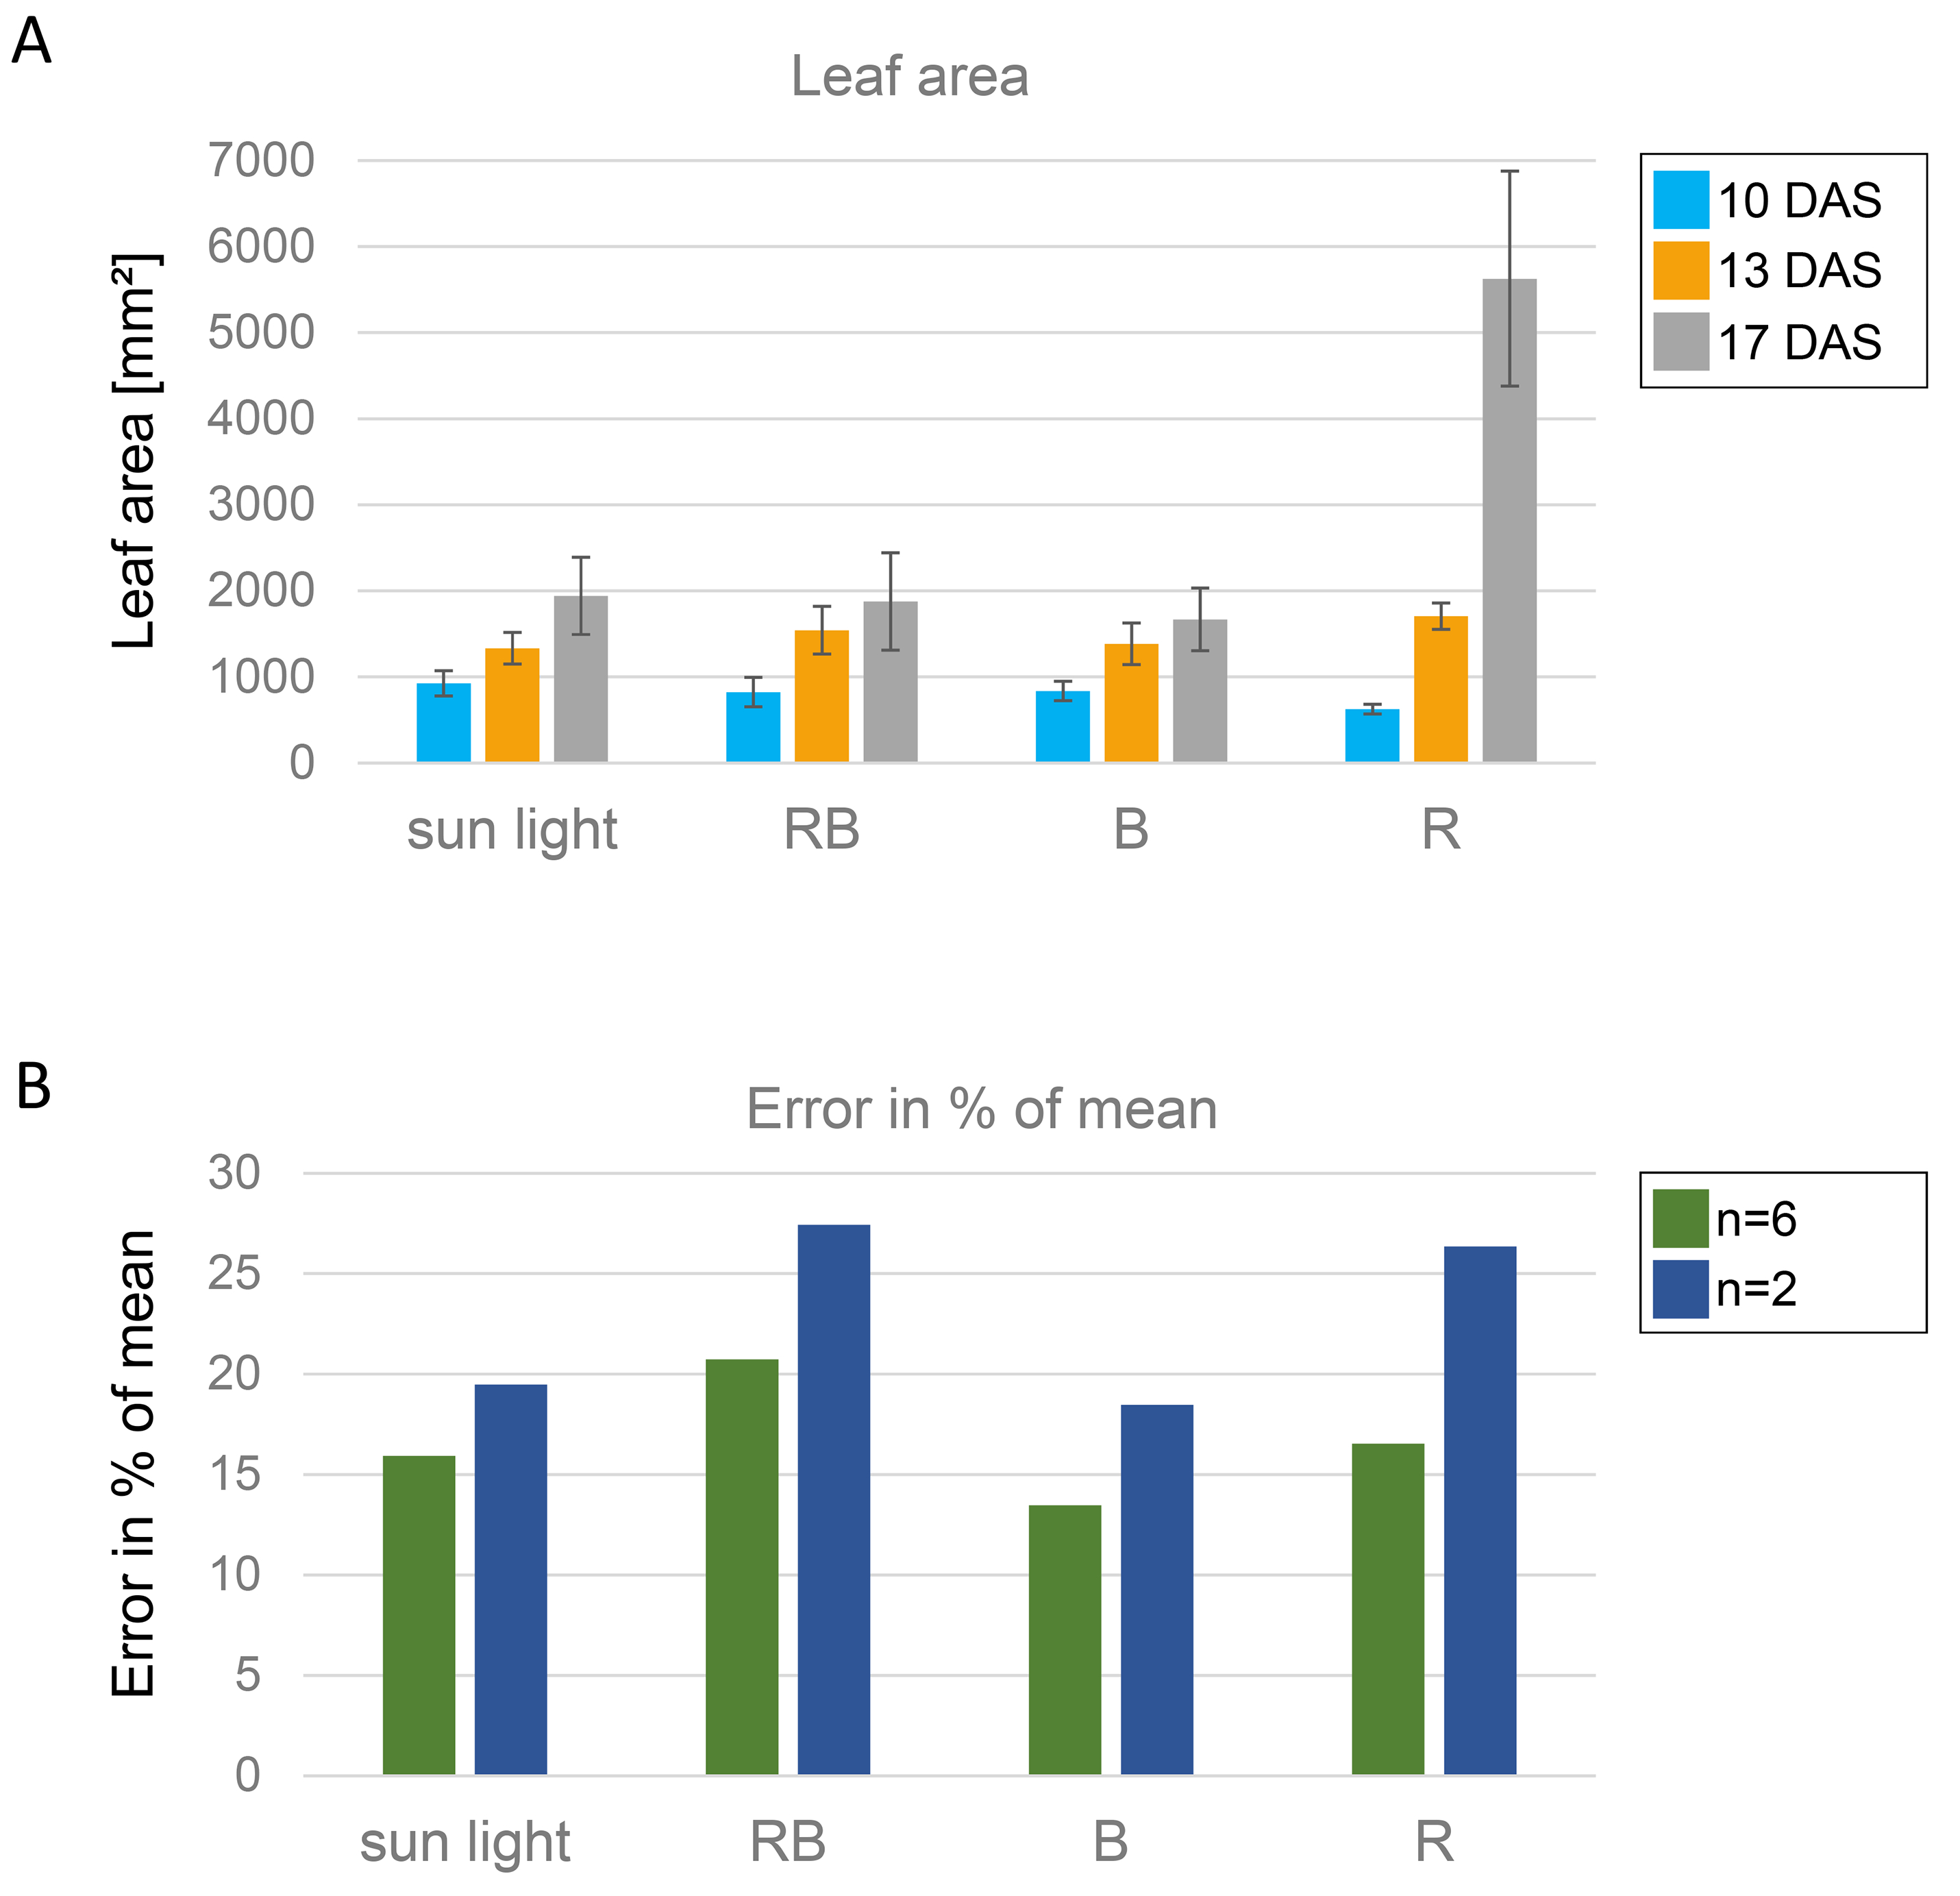 Analysis of Arabidopsis thaliana Growth Behavior in Different Light